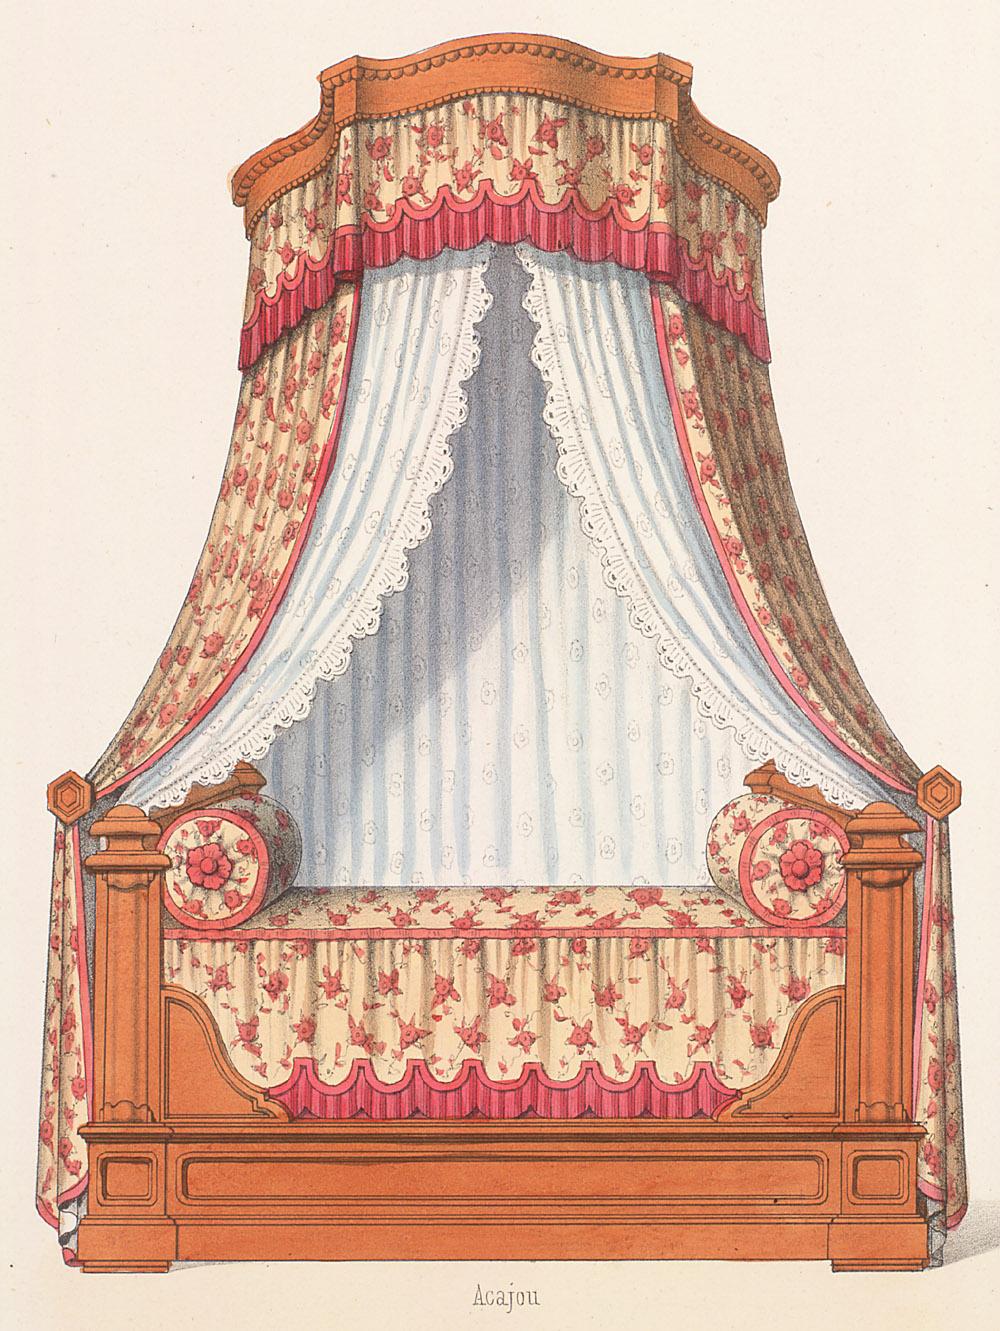 Beds (furniture),  Image number:SIL12-2-454b